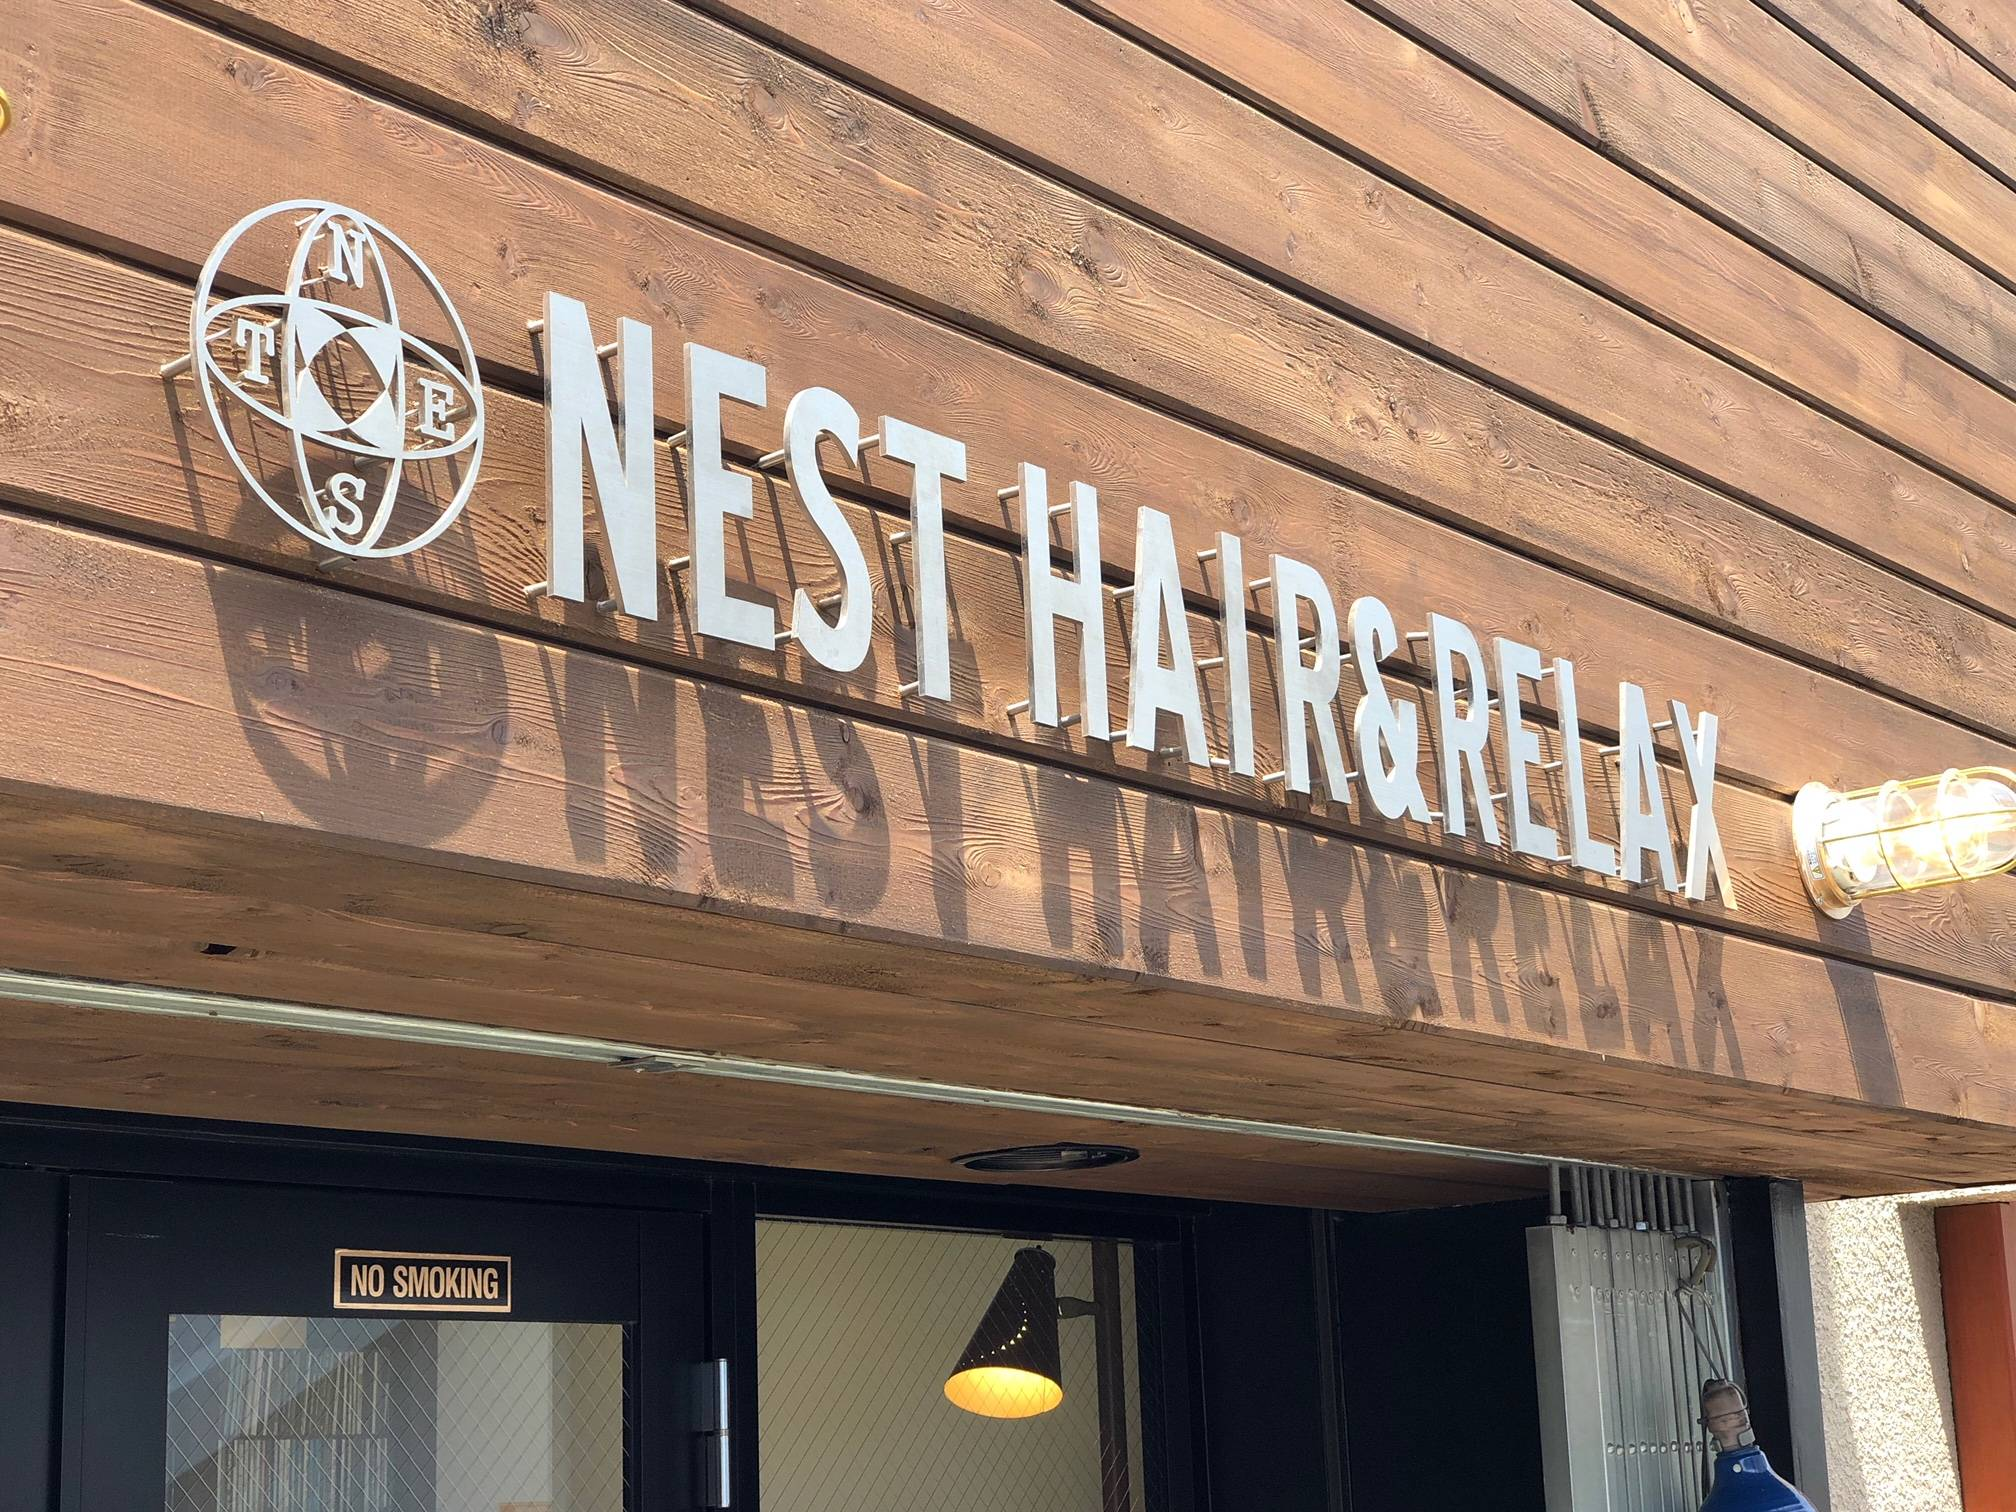 NEST hair&relax/株式会社スモールワンダー